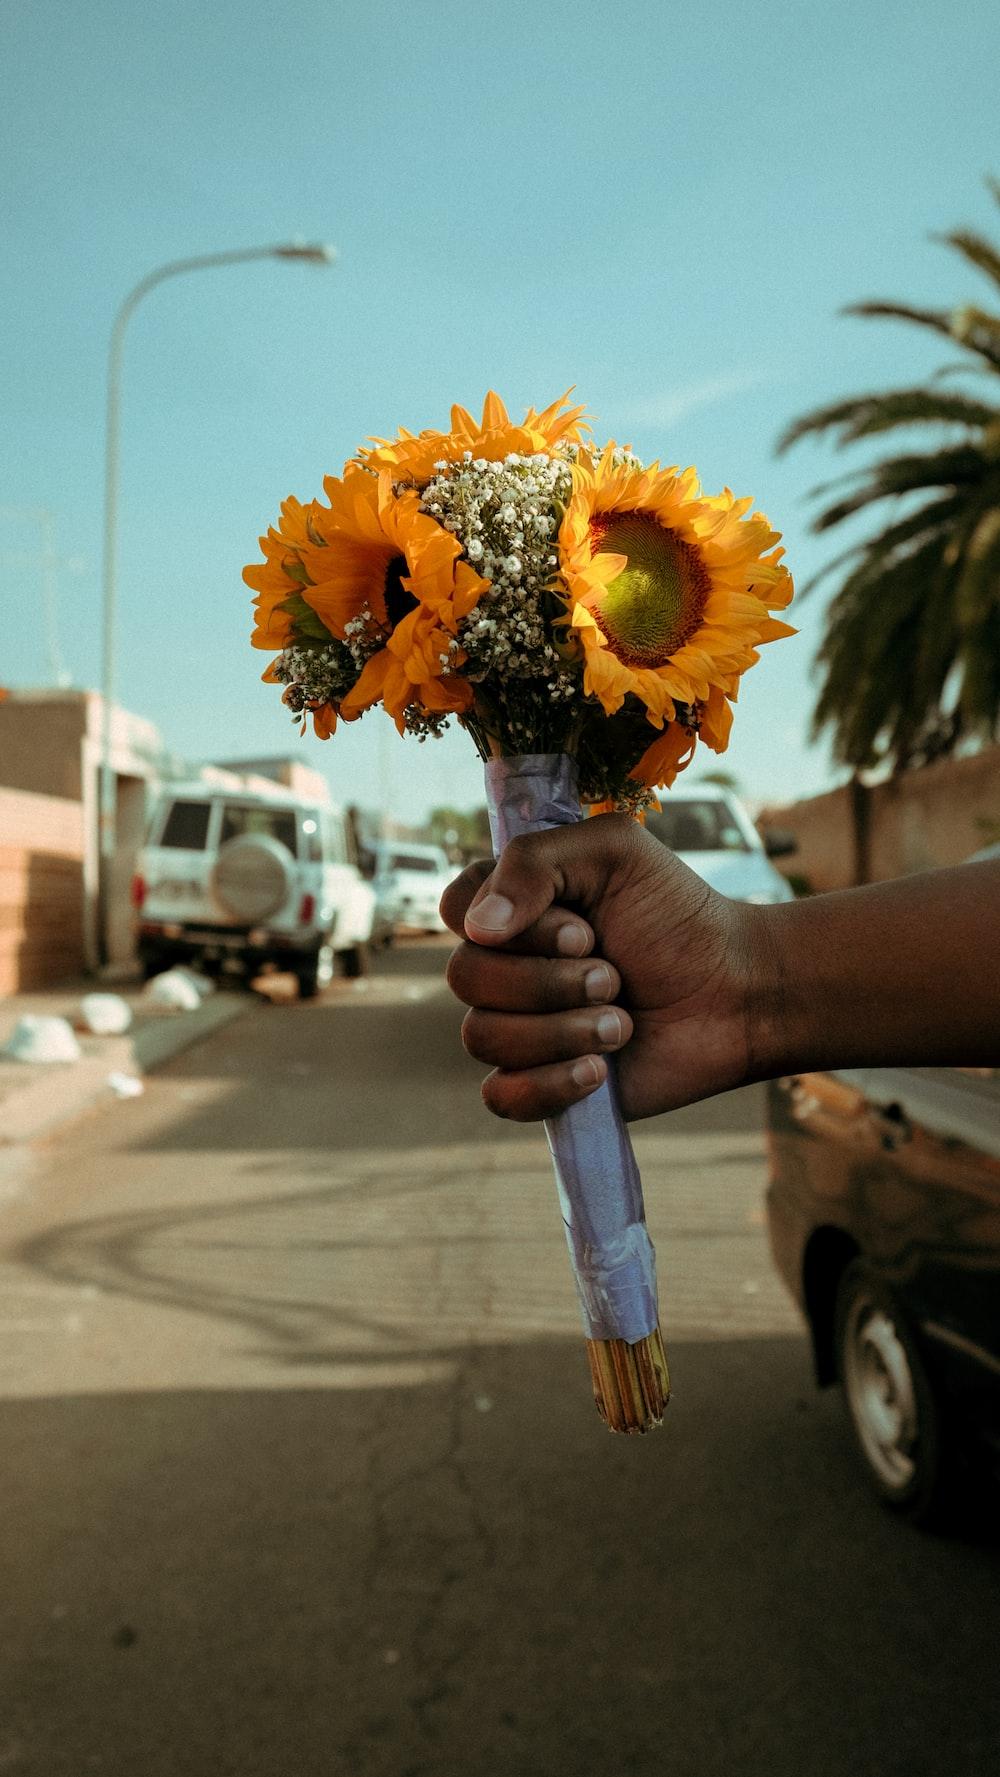 person hand holding sunflower bouquet